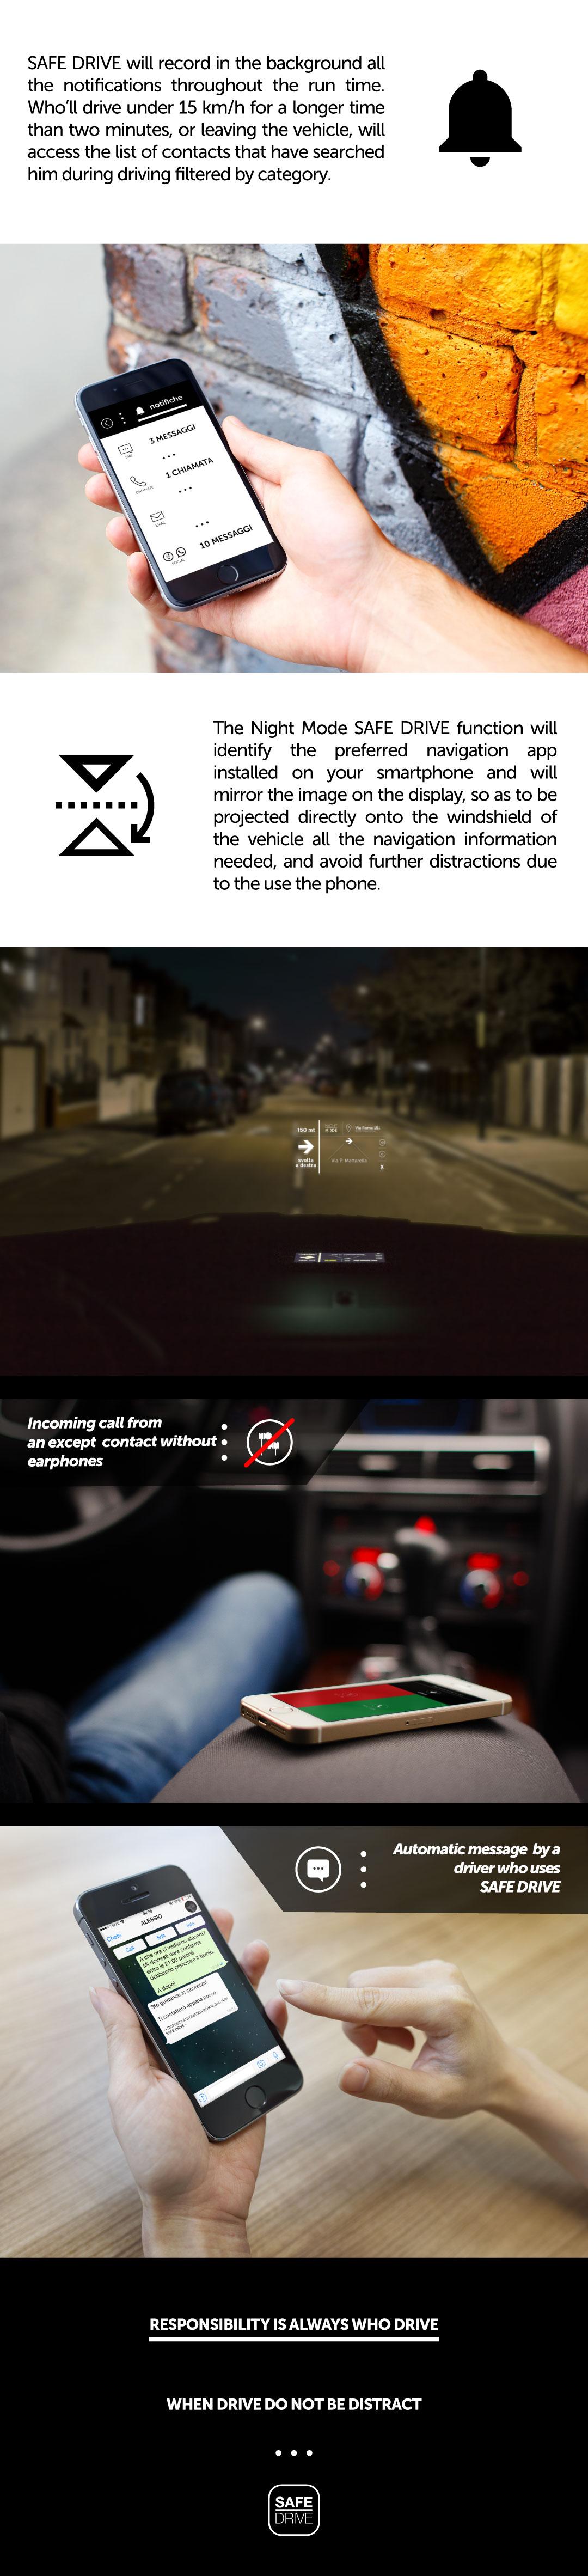 safe_drive_en_2